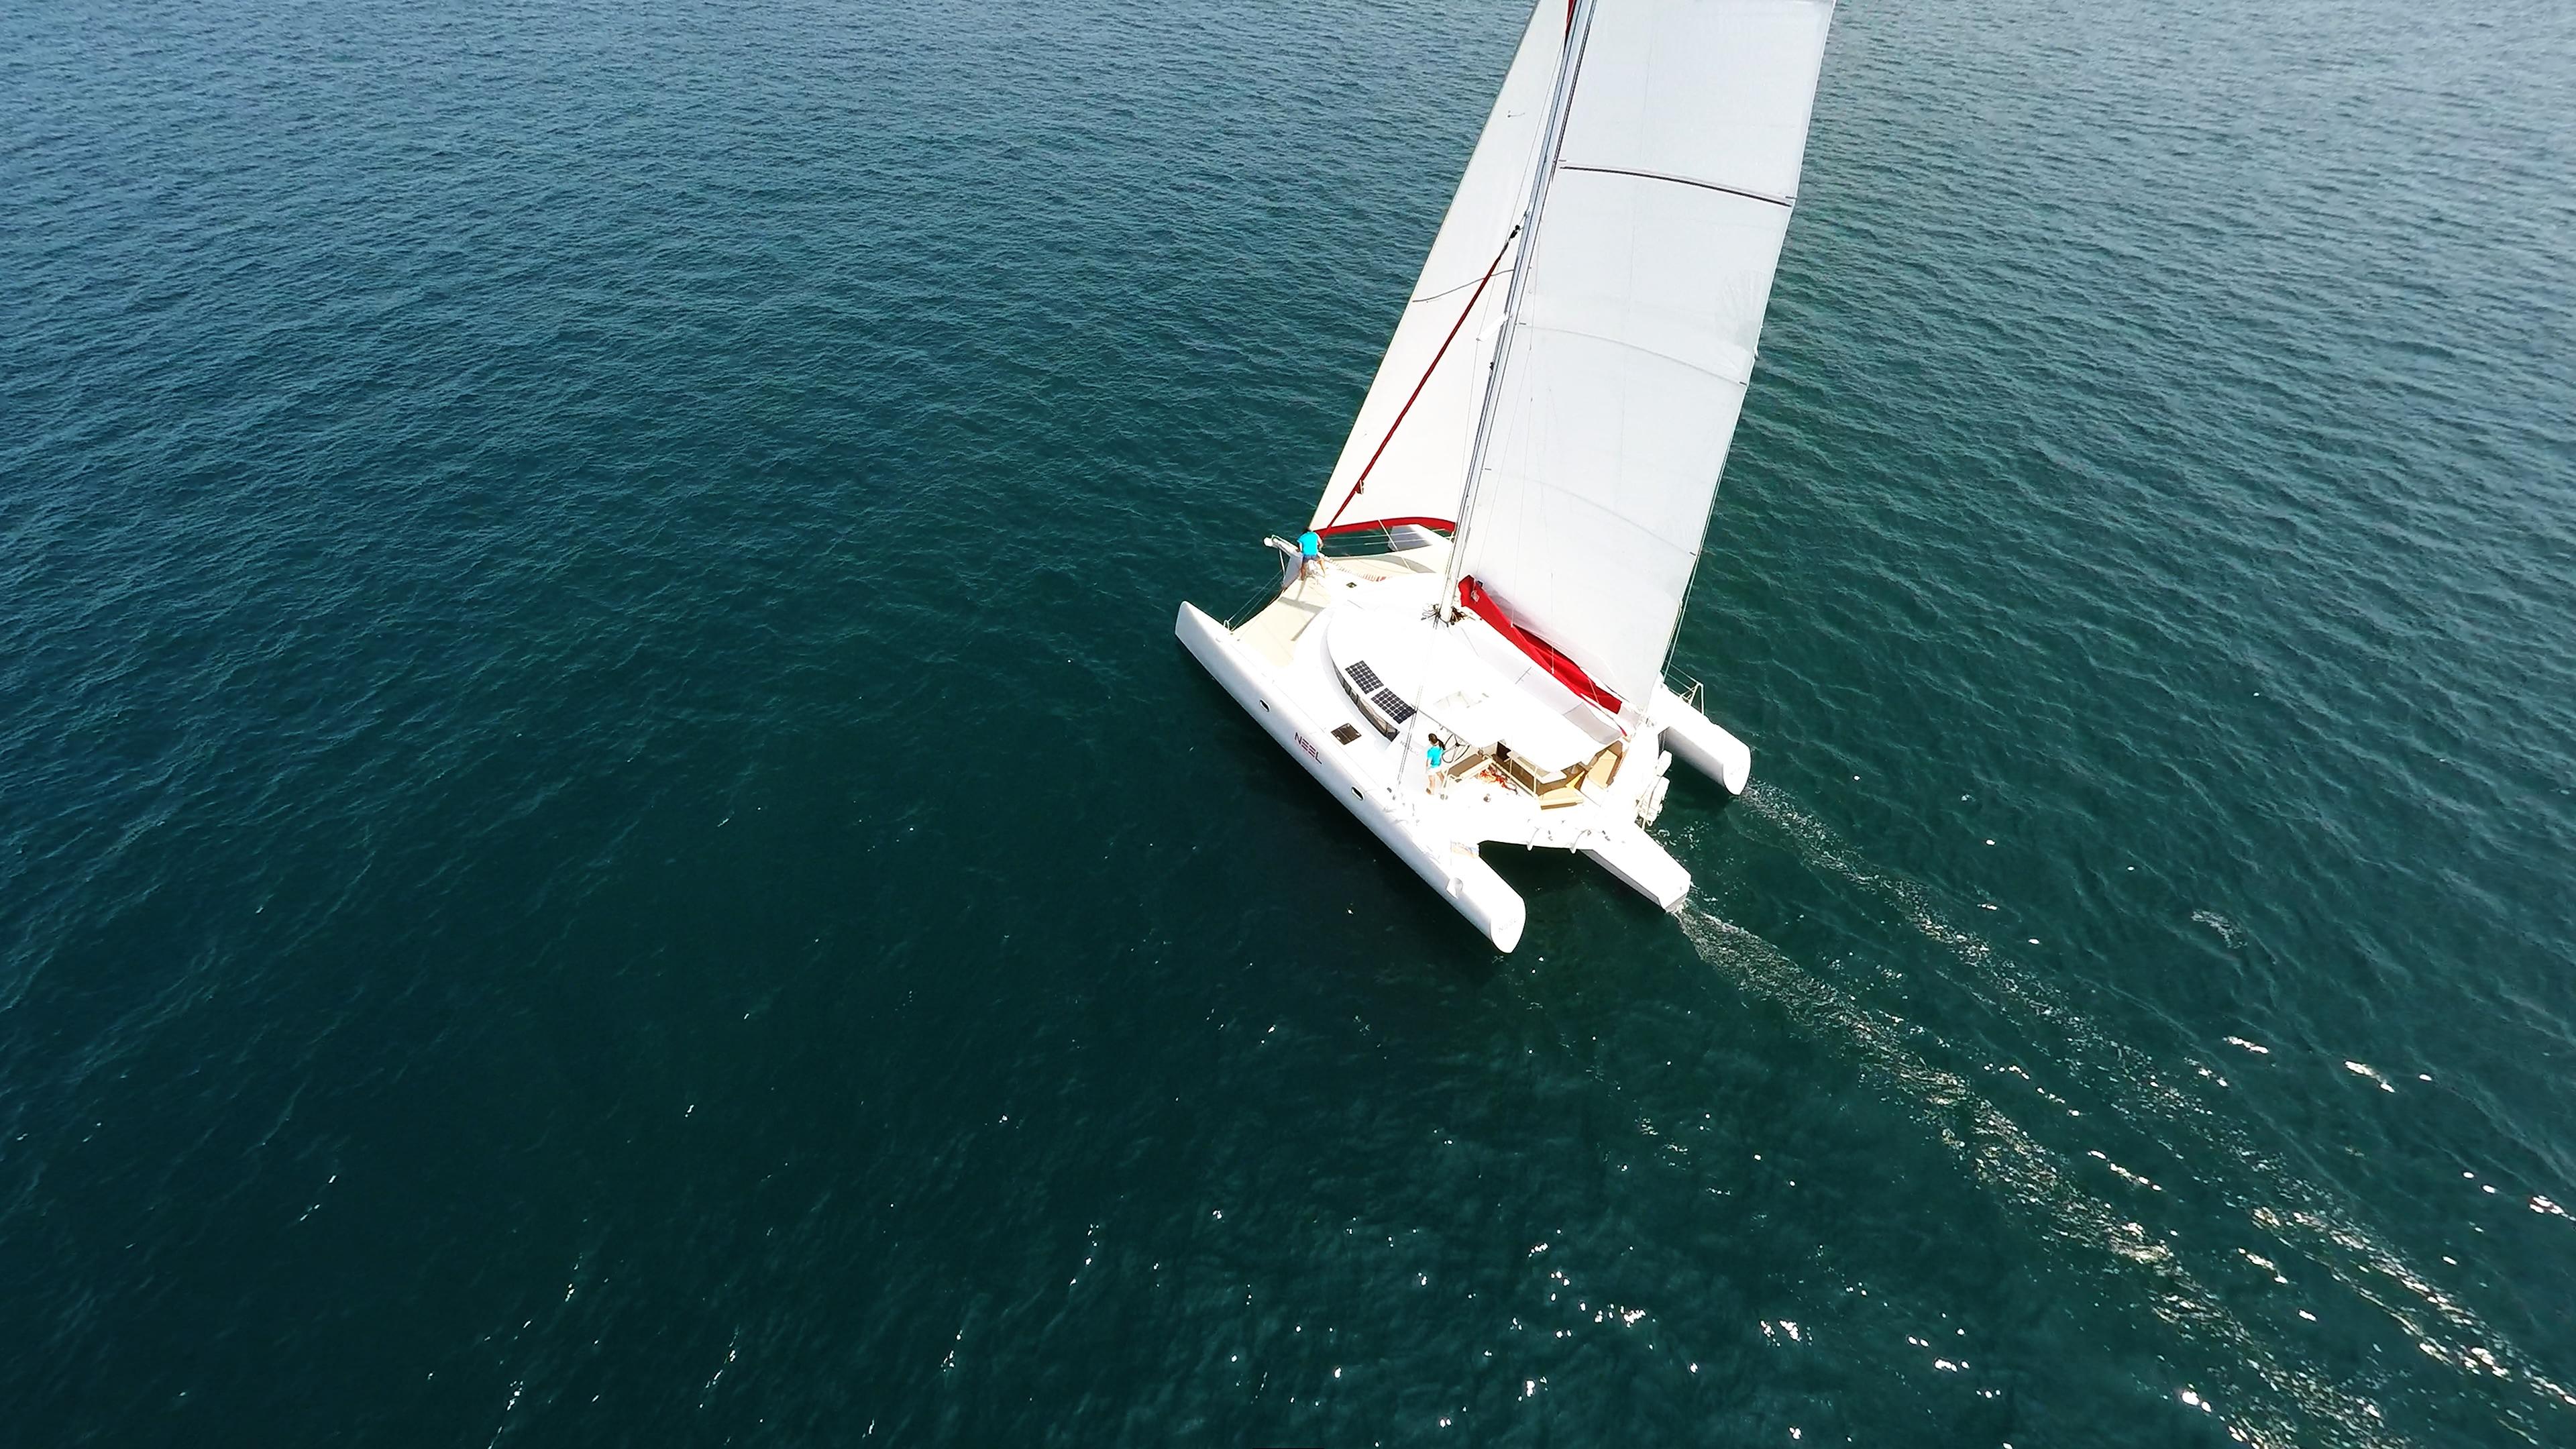 yachting multiscafo vela